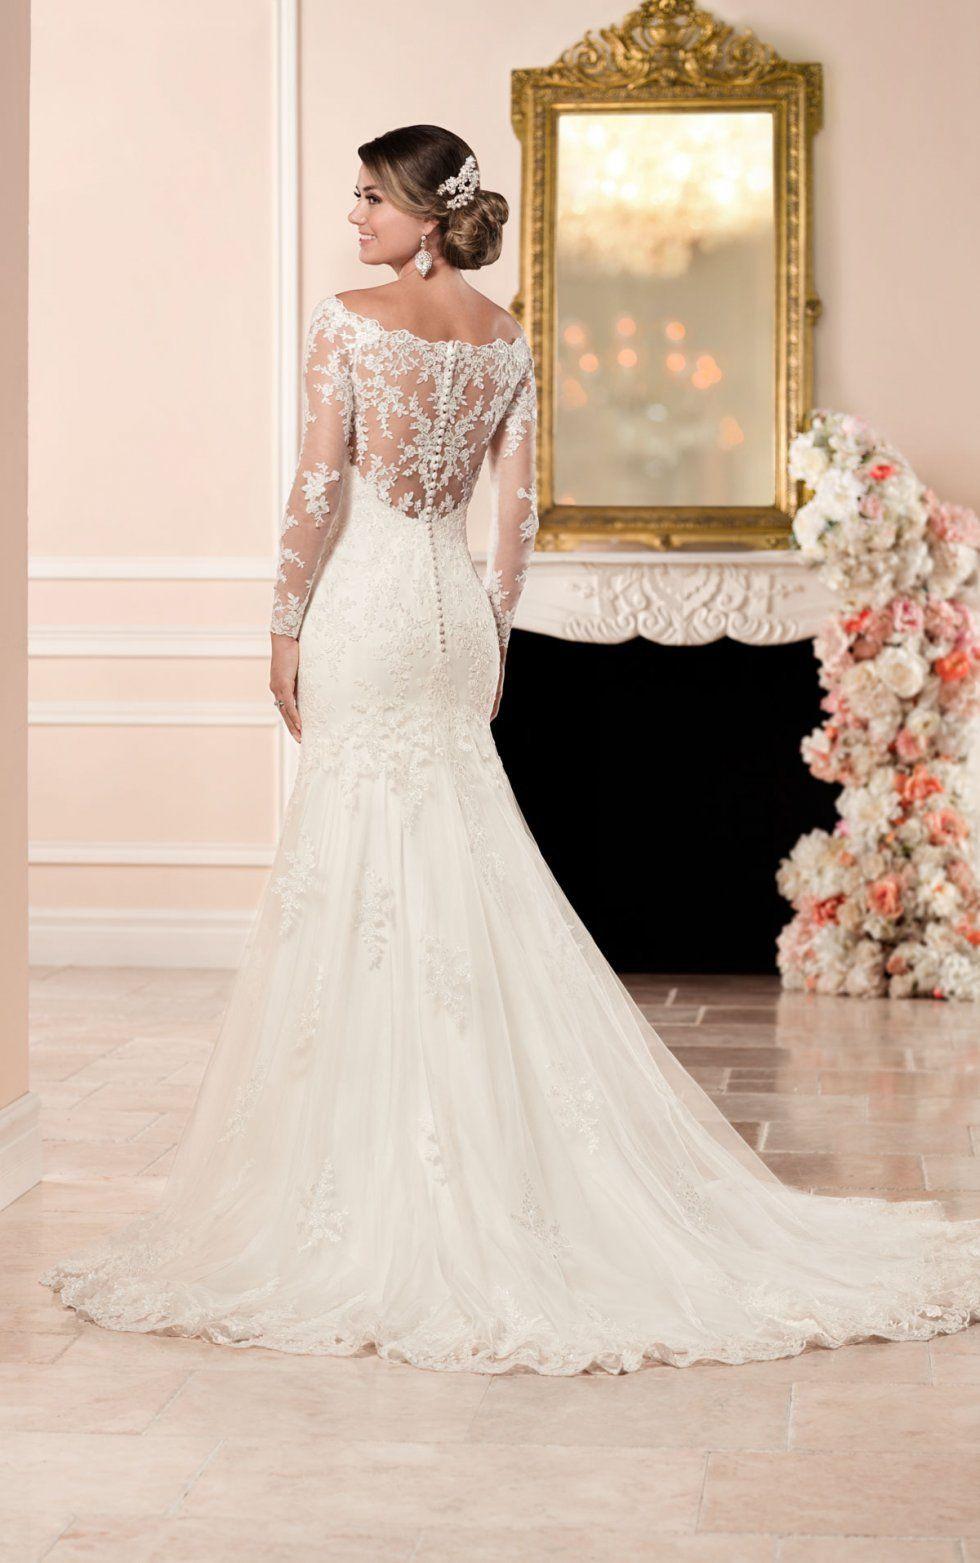 Long Sleeve Wedding Dress With Illusion Back Stella York Stella York Wedding Dress Fit And Flare Wedding Dress Fitted Wedding Dress [ 1563 x 980 Pixel ]